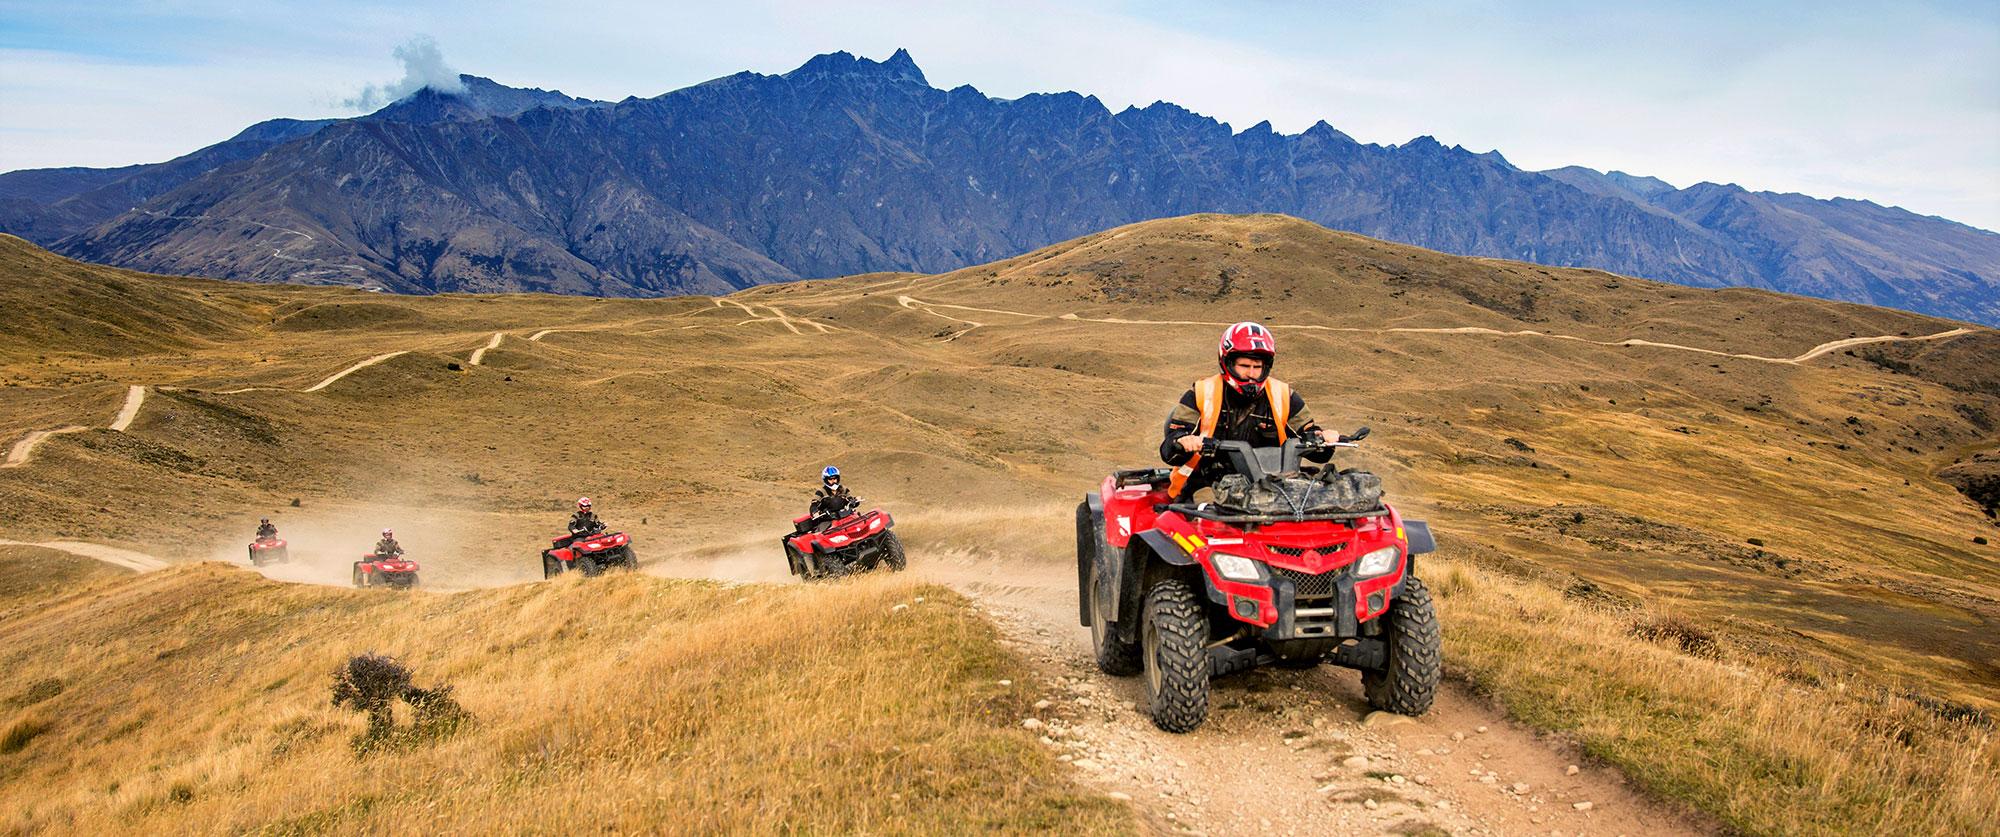 New Zealand Vacations - Nomad Safaris